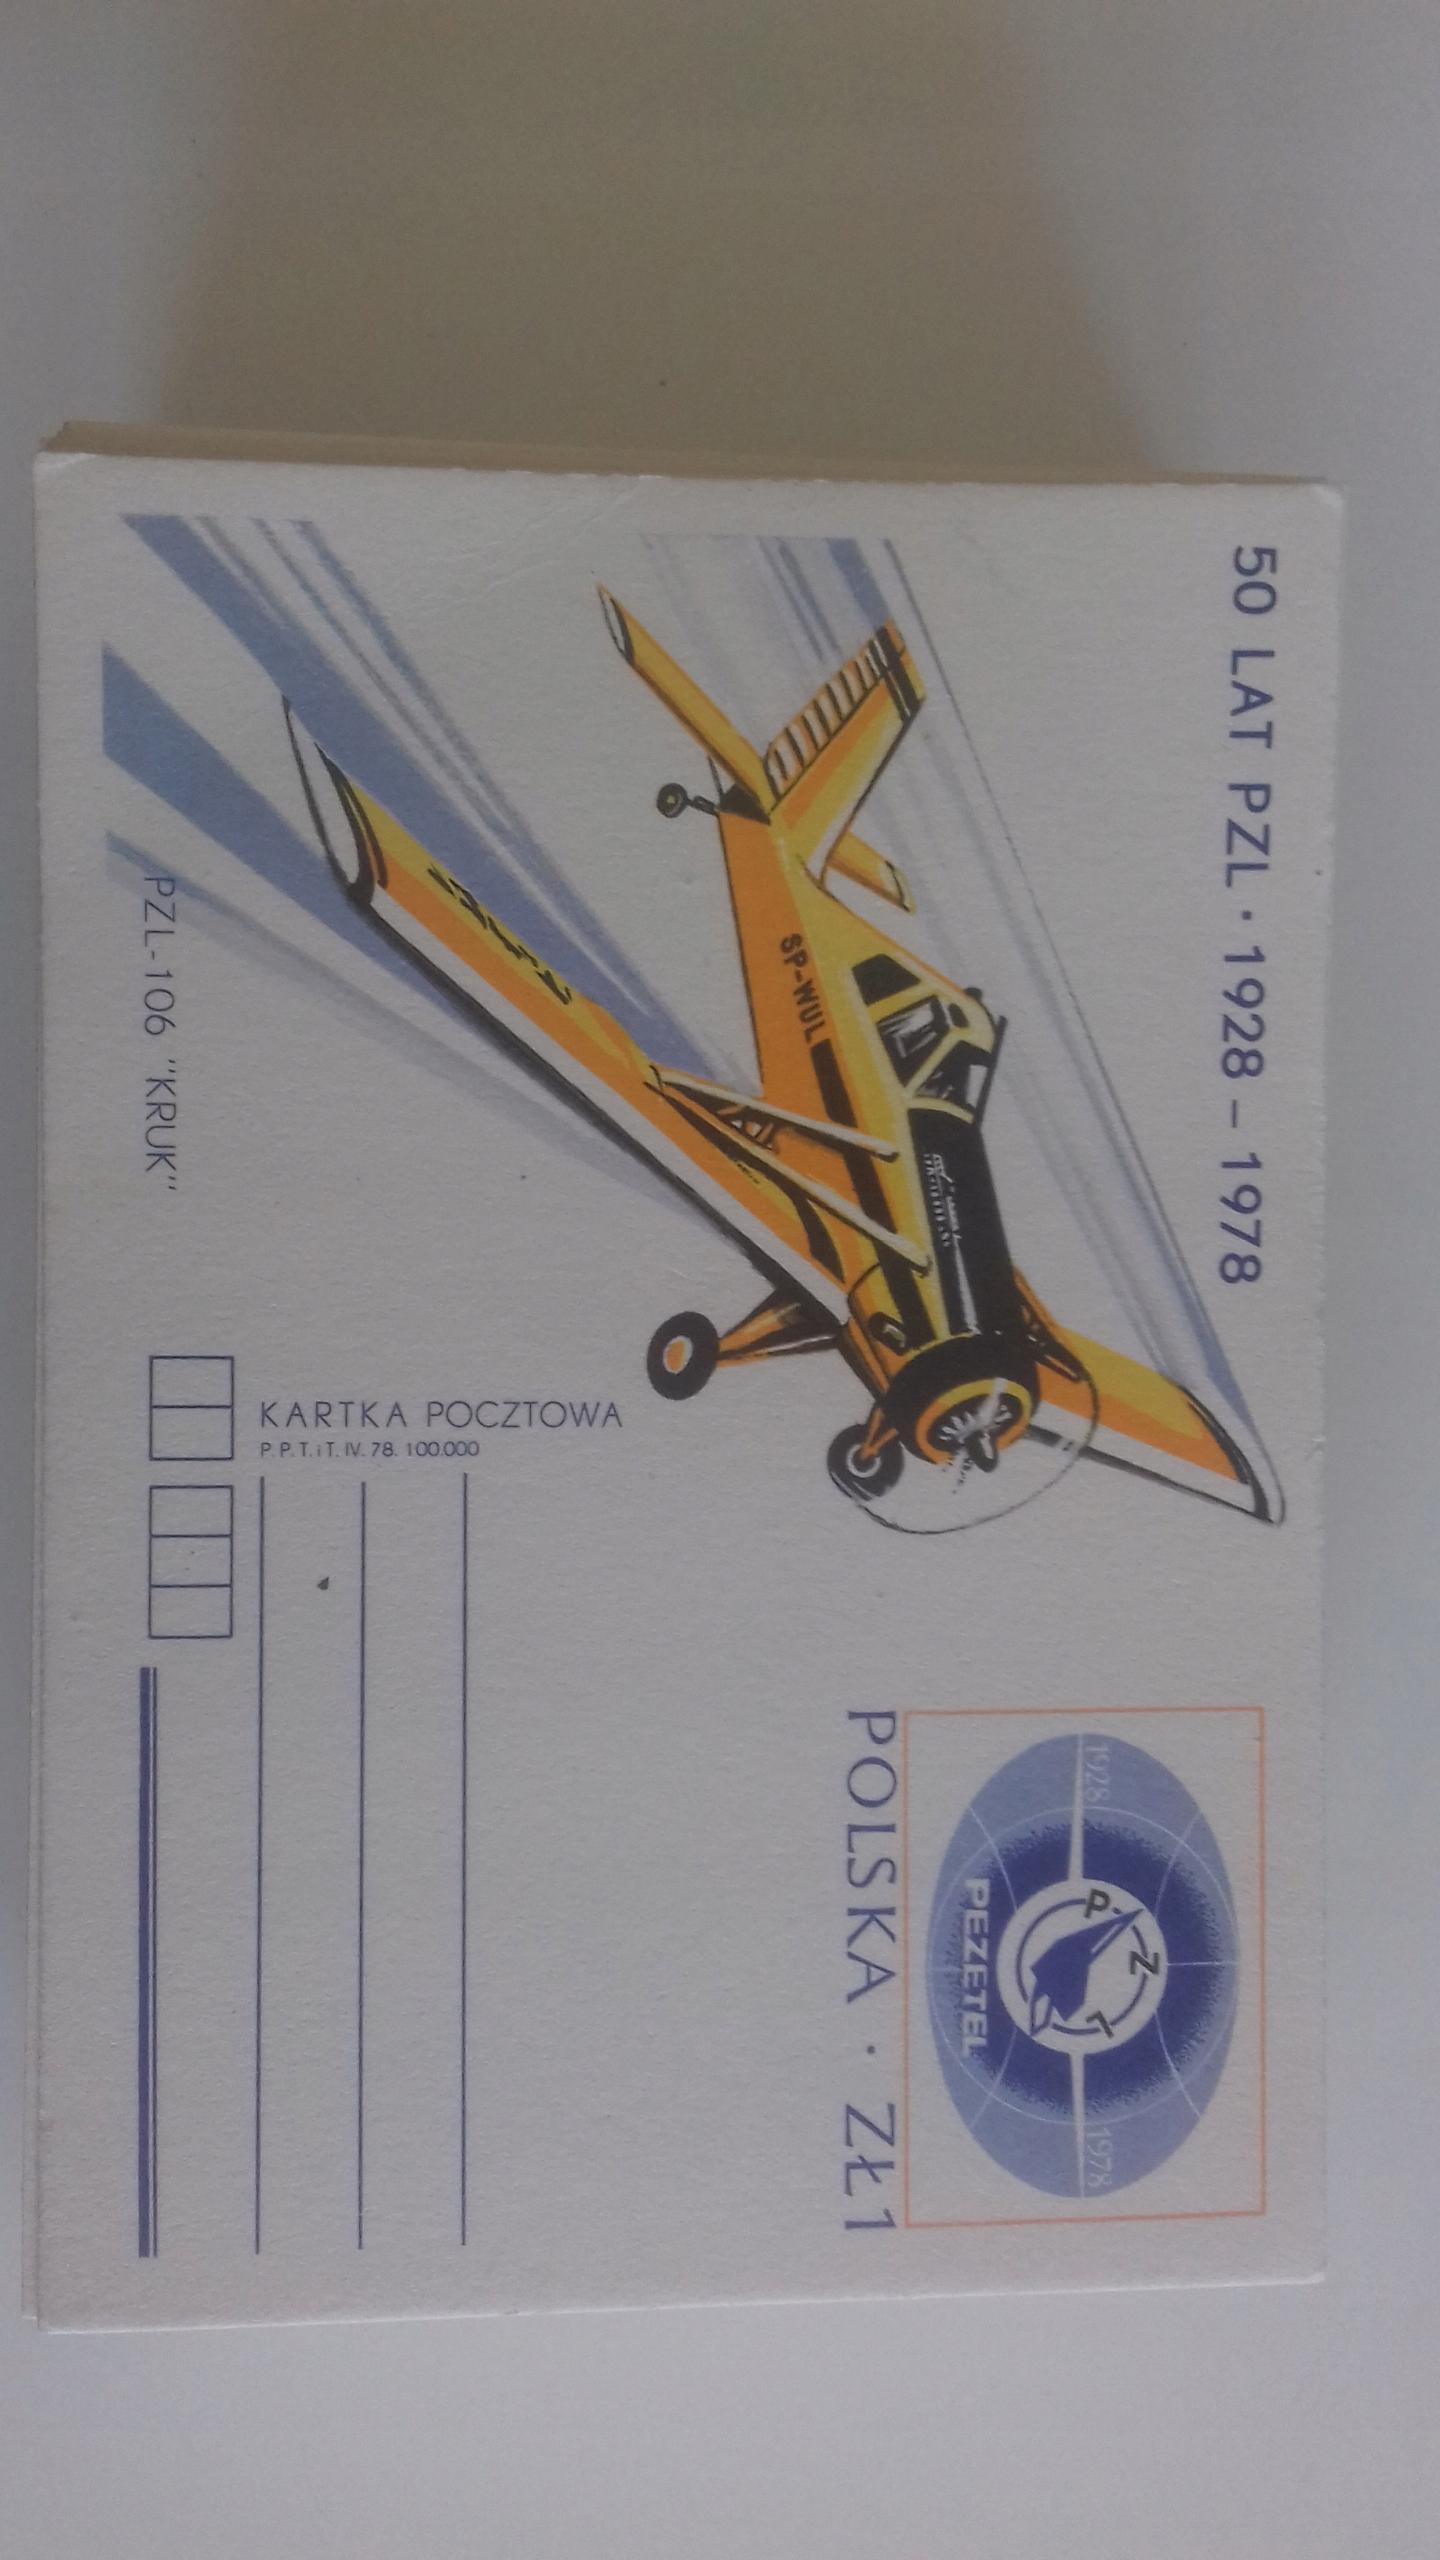 Kartka pocztowa 50 lat PZL 1928-1978